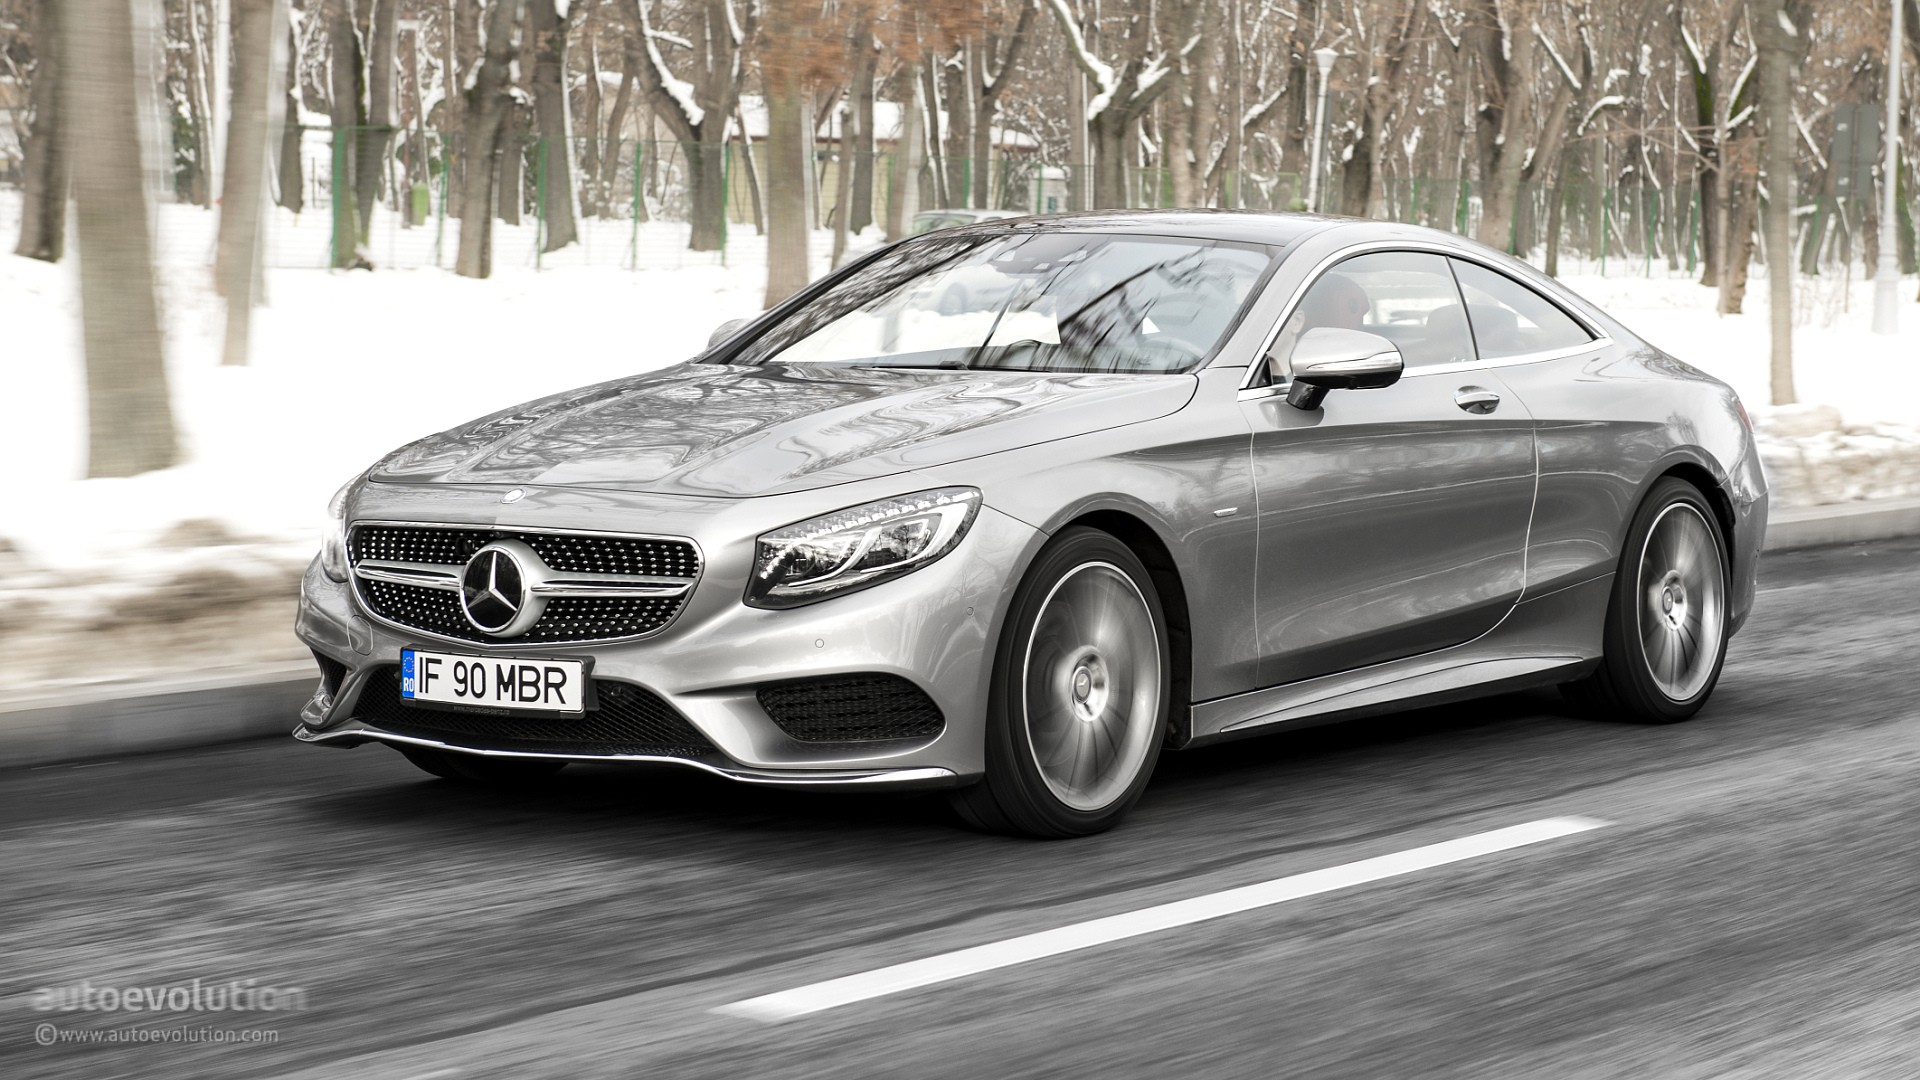 2015 Mercedes Benz S Class Coupe Review Autoevolution